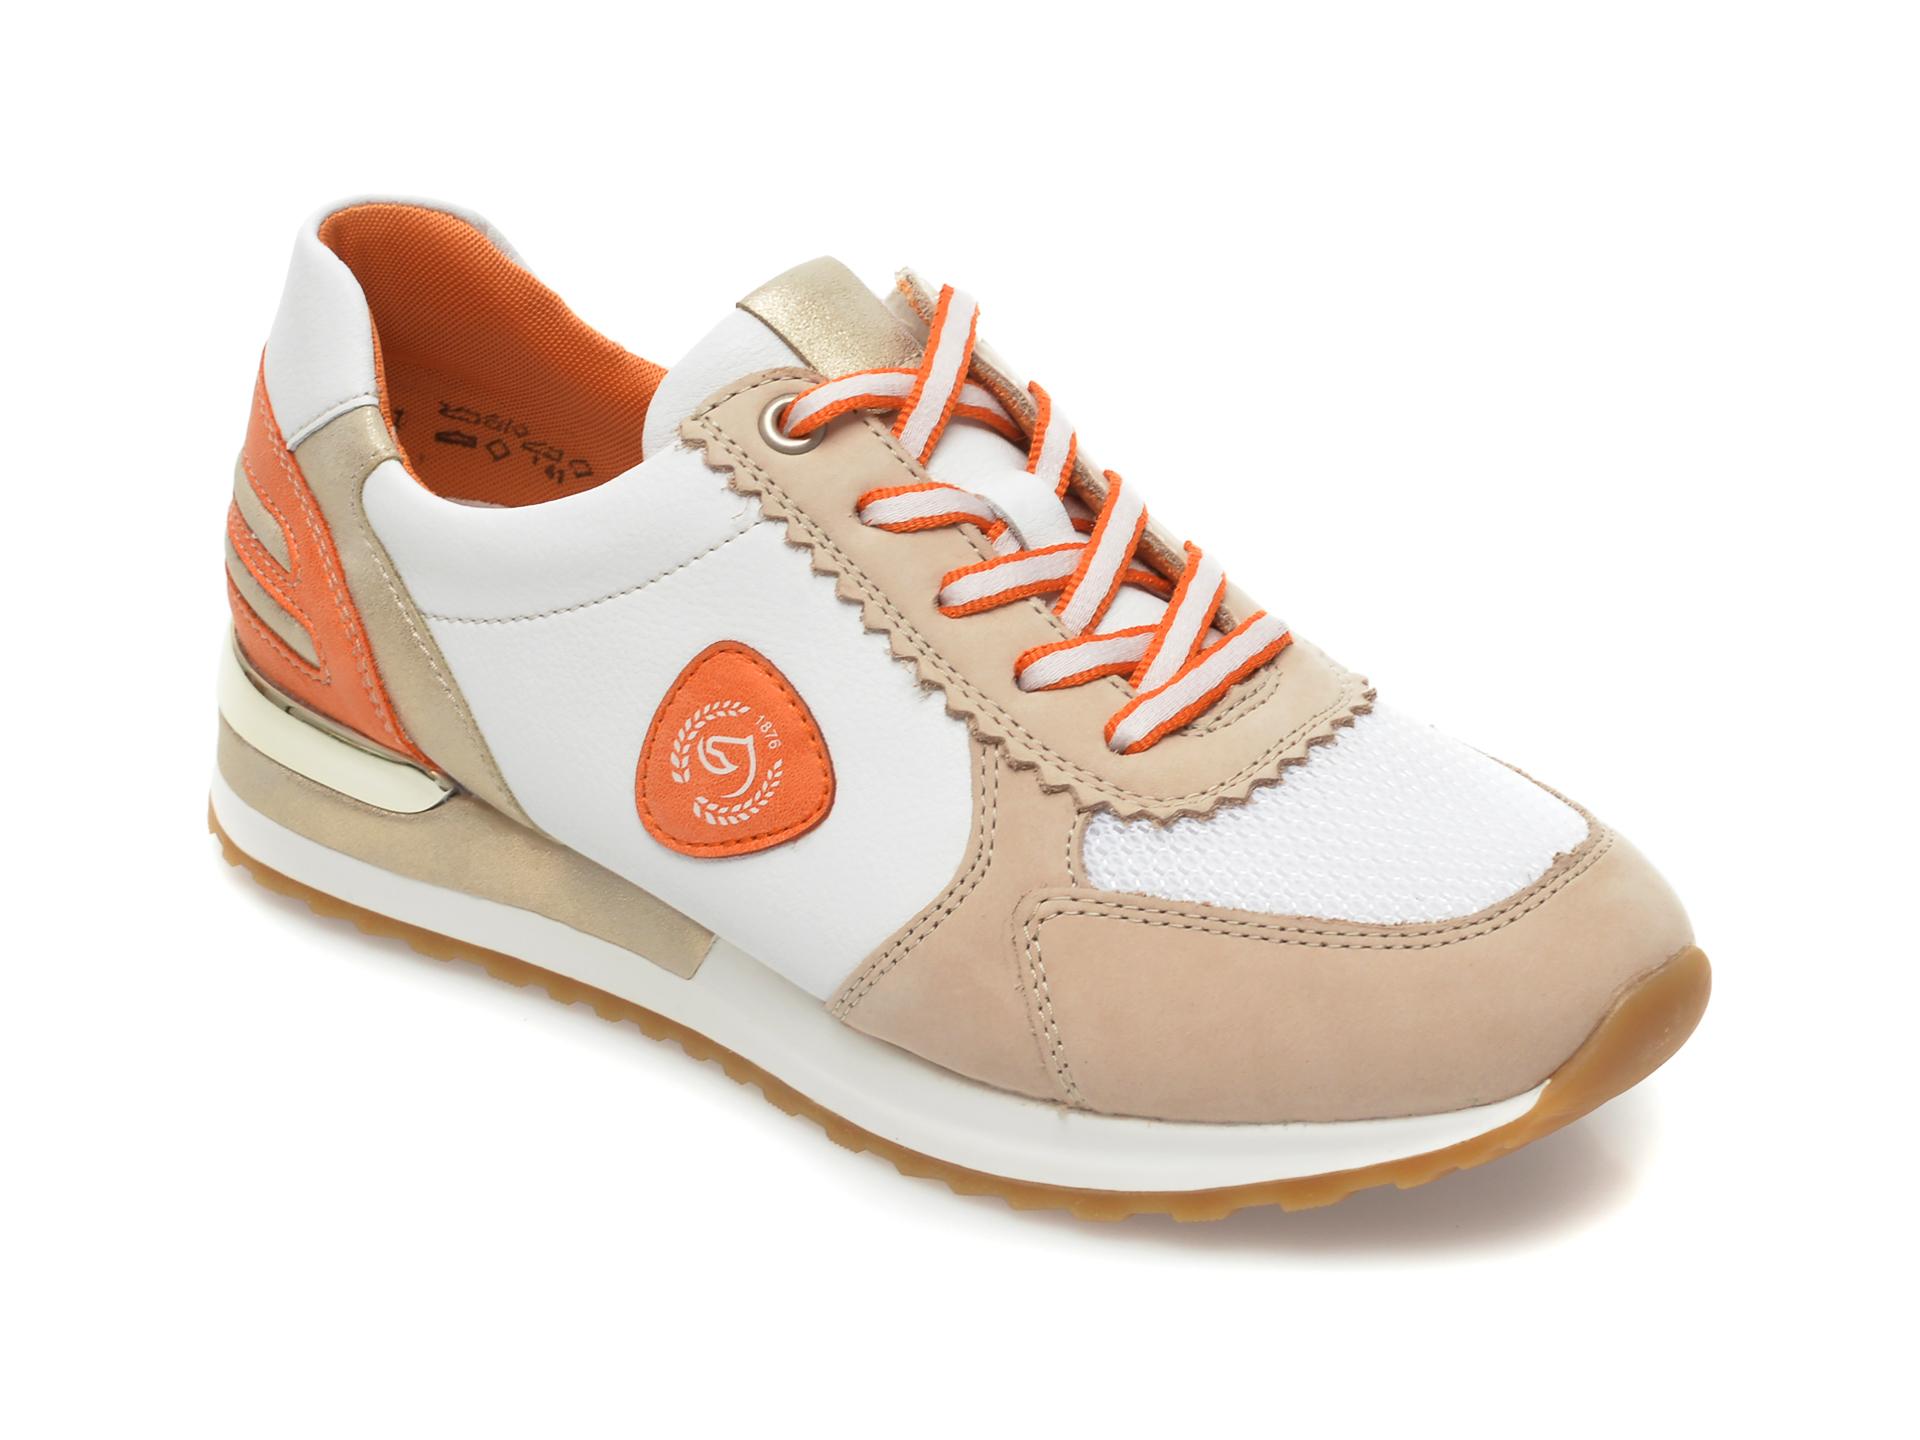 Pantofi sport REMONTE albi, R2527, din material textil si piele ecologica New